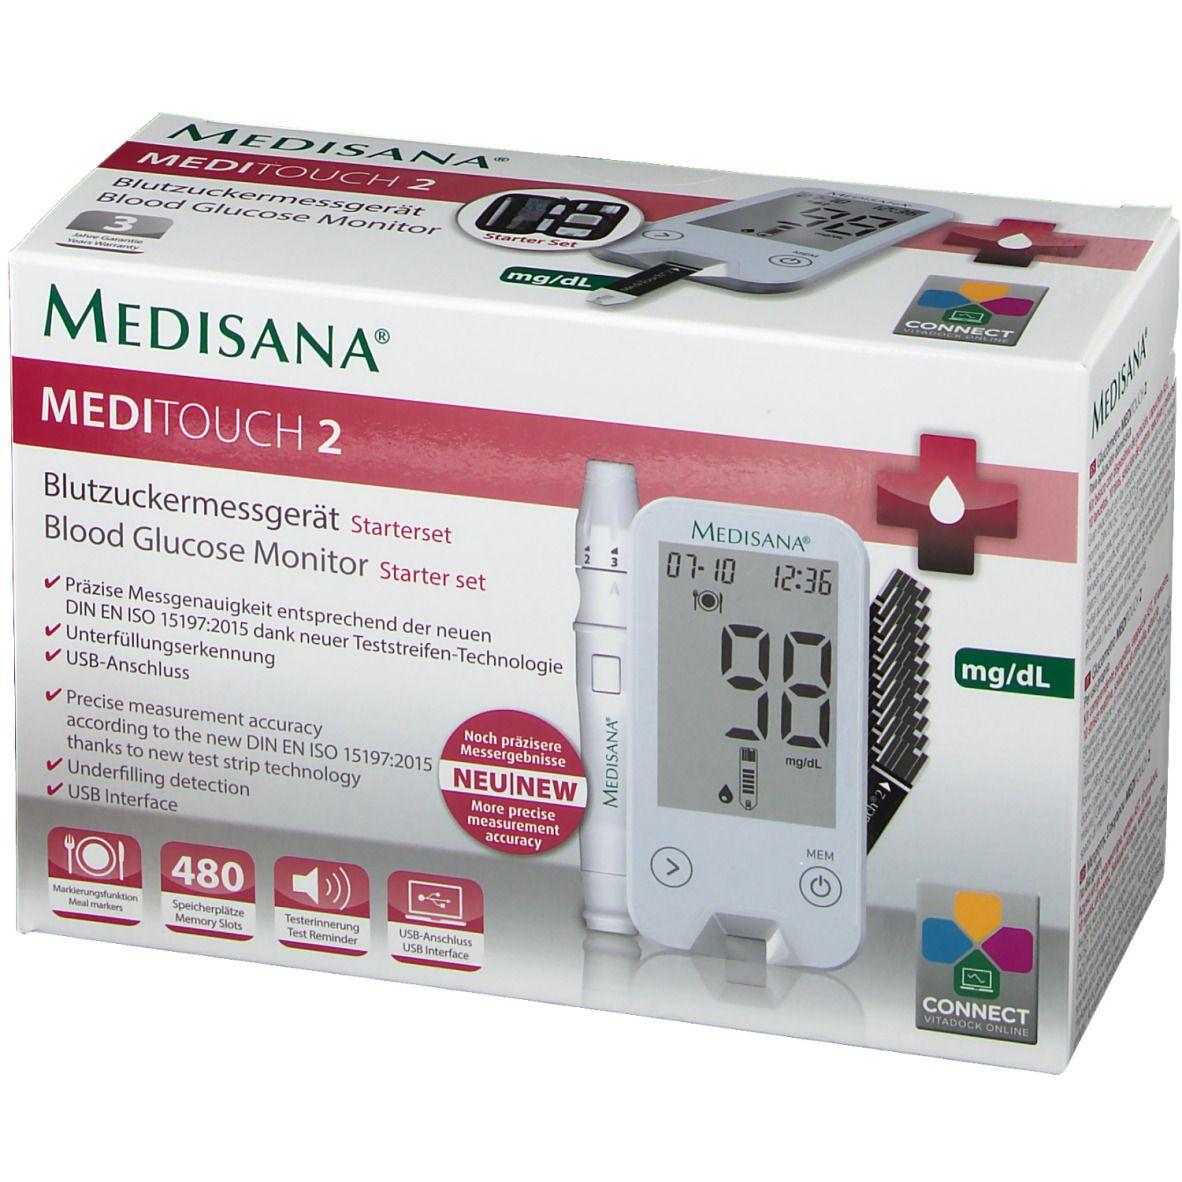 MediTouch® 2 mg/dL Blutzuckermessgerät inkl. Starterset